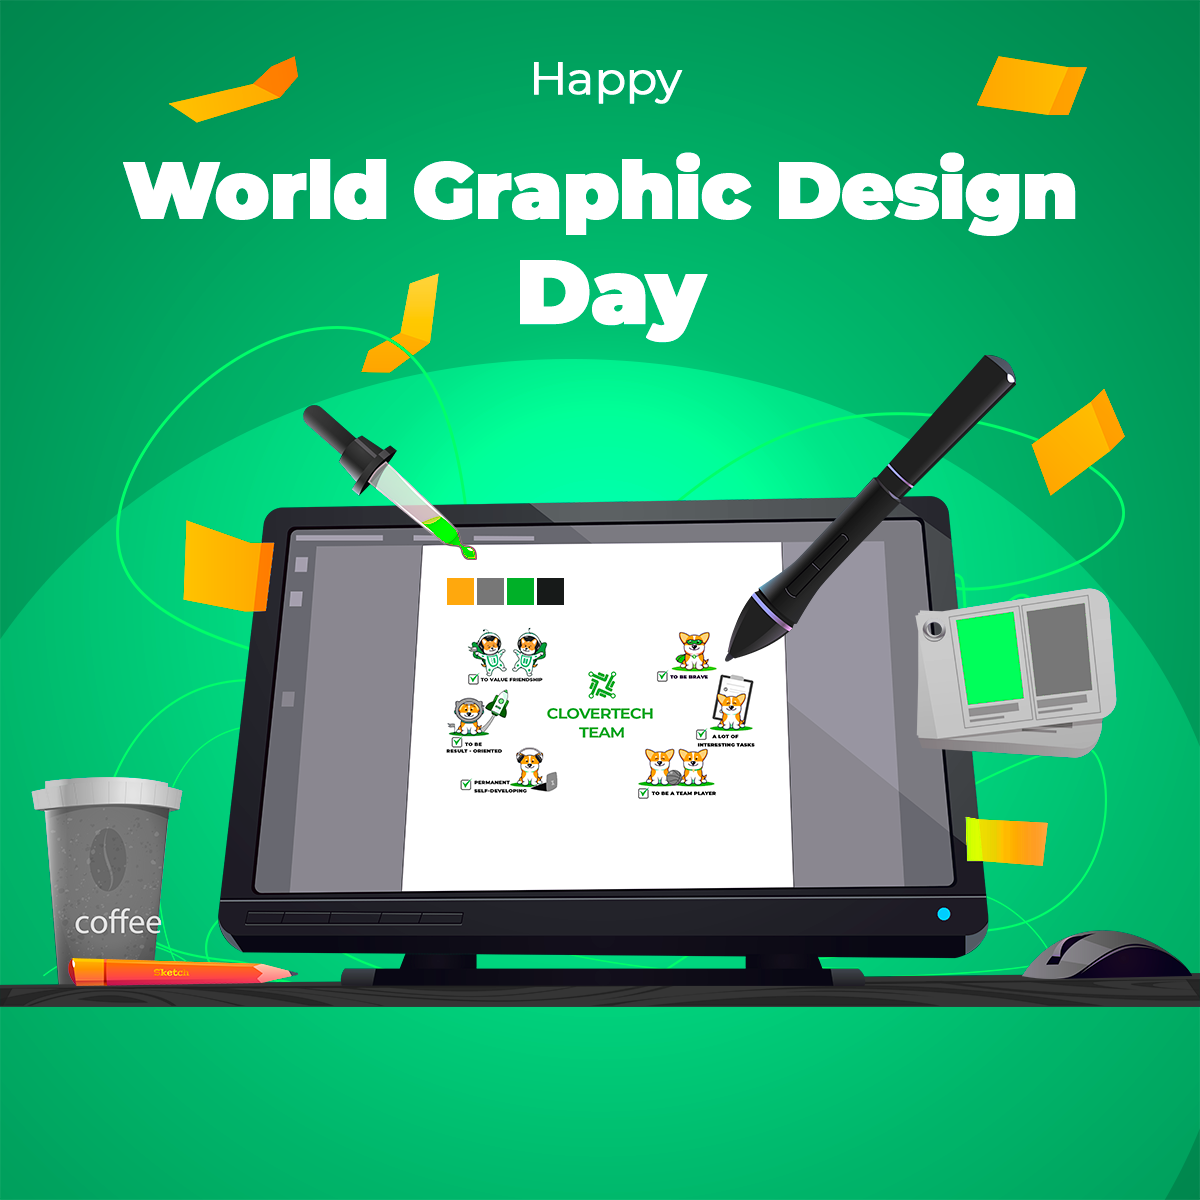 Happy World Graphic Design Day!